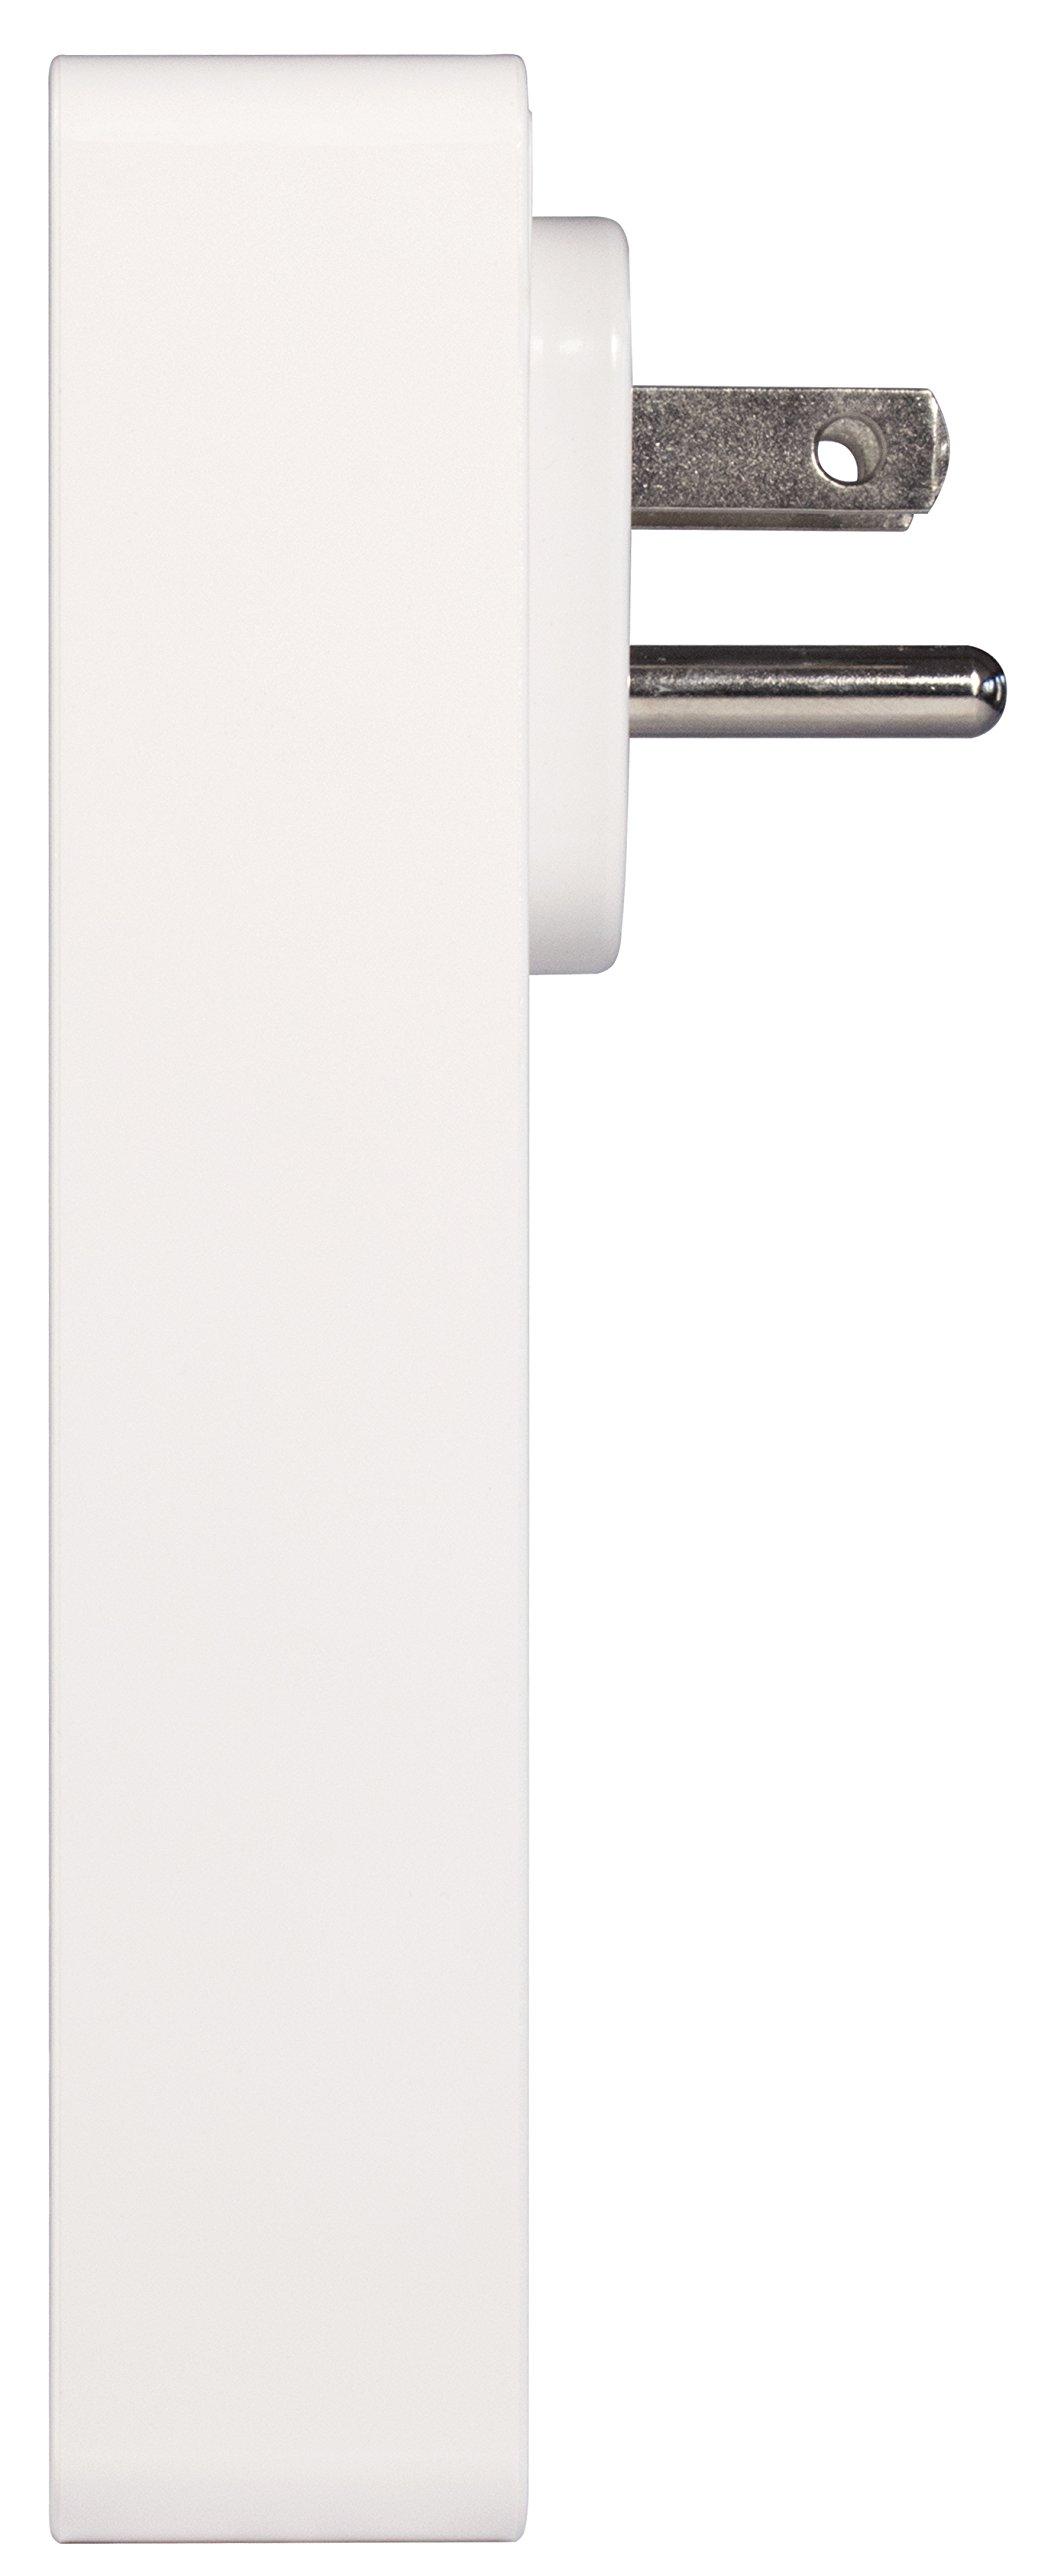 Extollo Ethernet Powerline LANPlug 2000 G.hn MIMO (Single Unit) by Extollo Communications (Image #5)